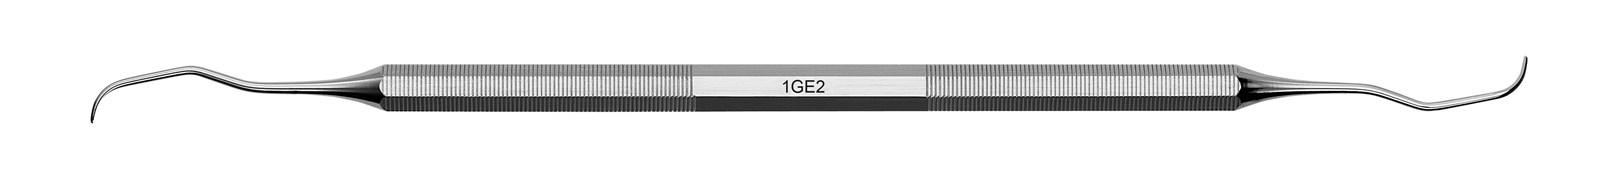 Kyreta Gracey Classic - 1GE2, Bez návleku